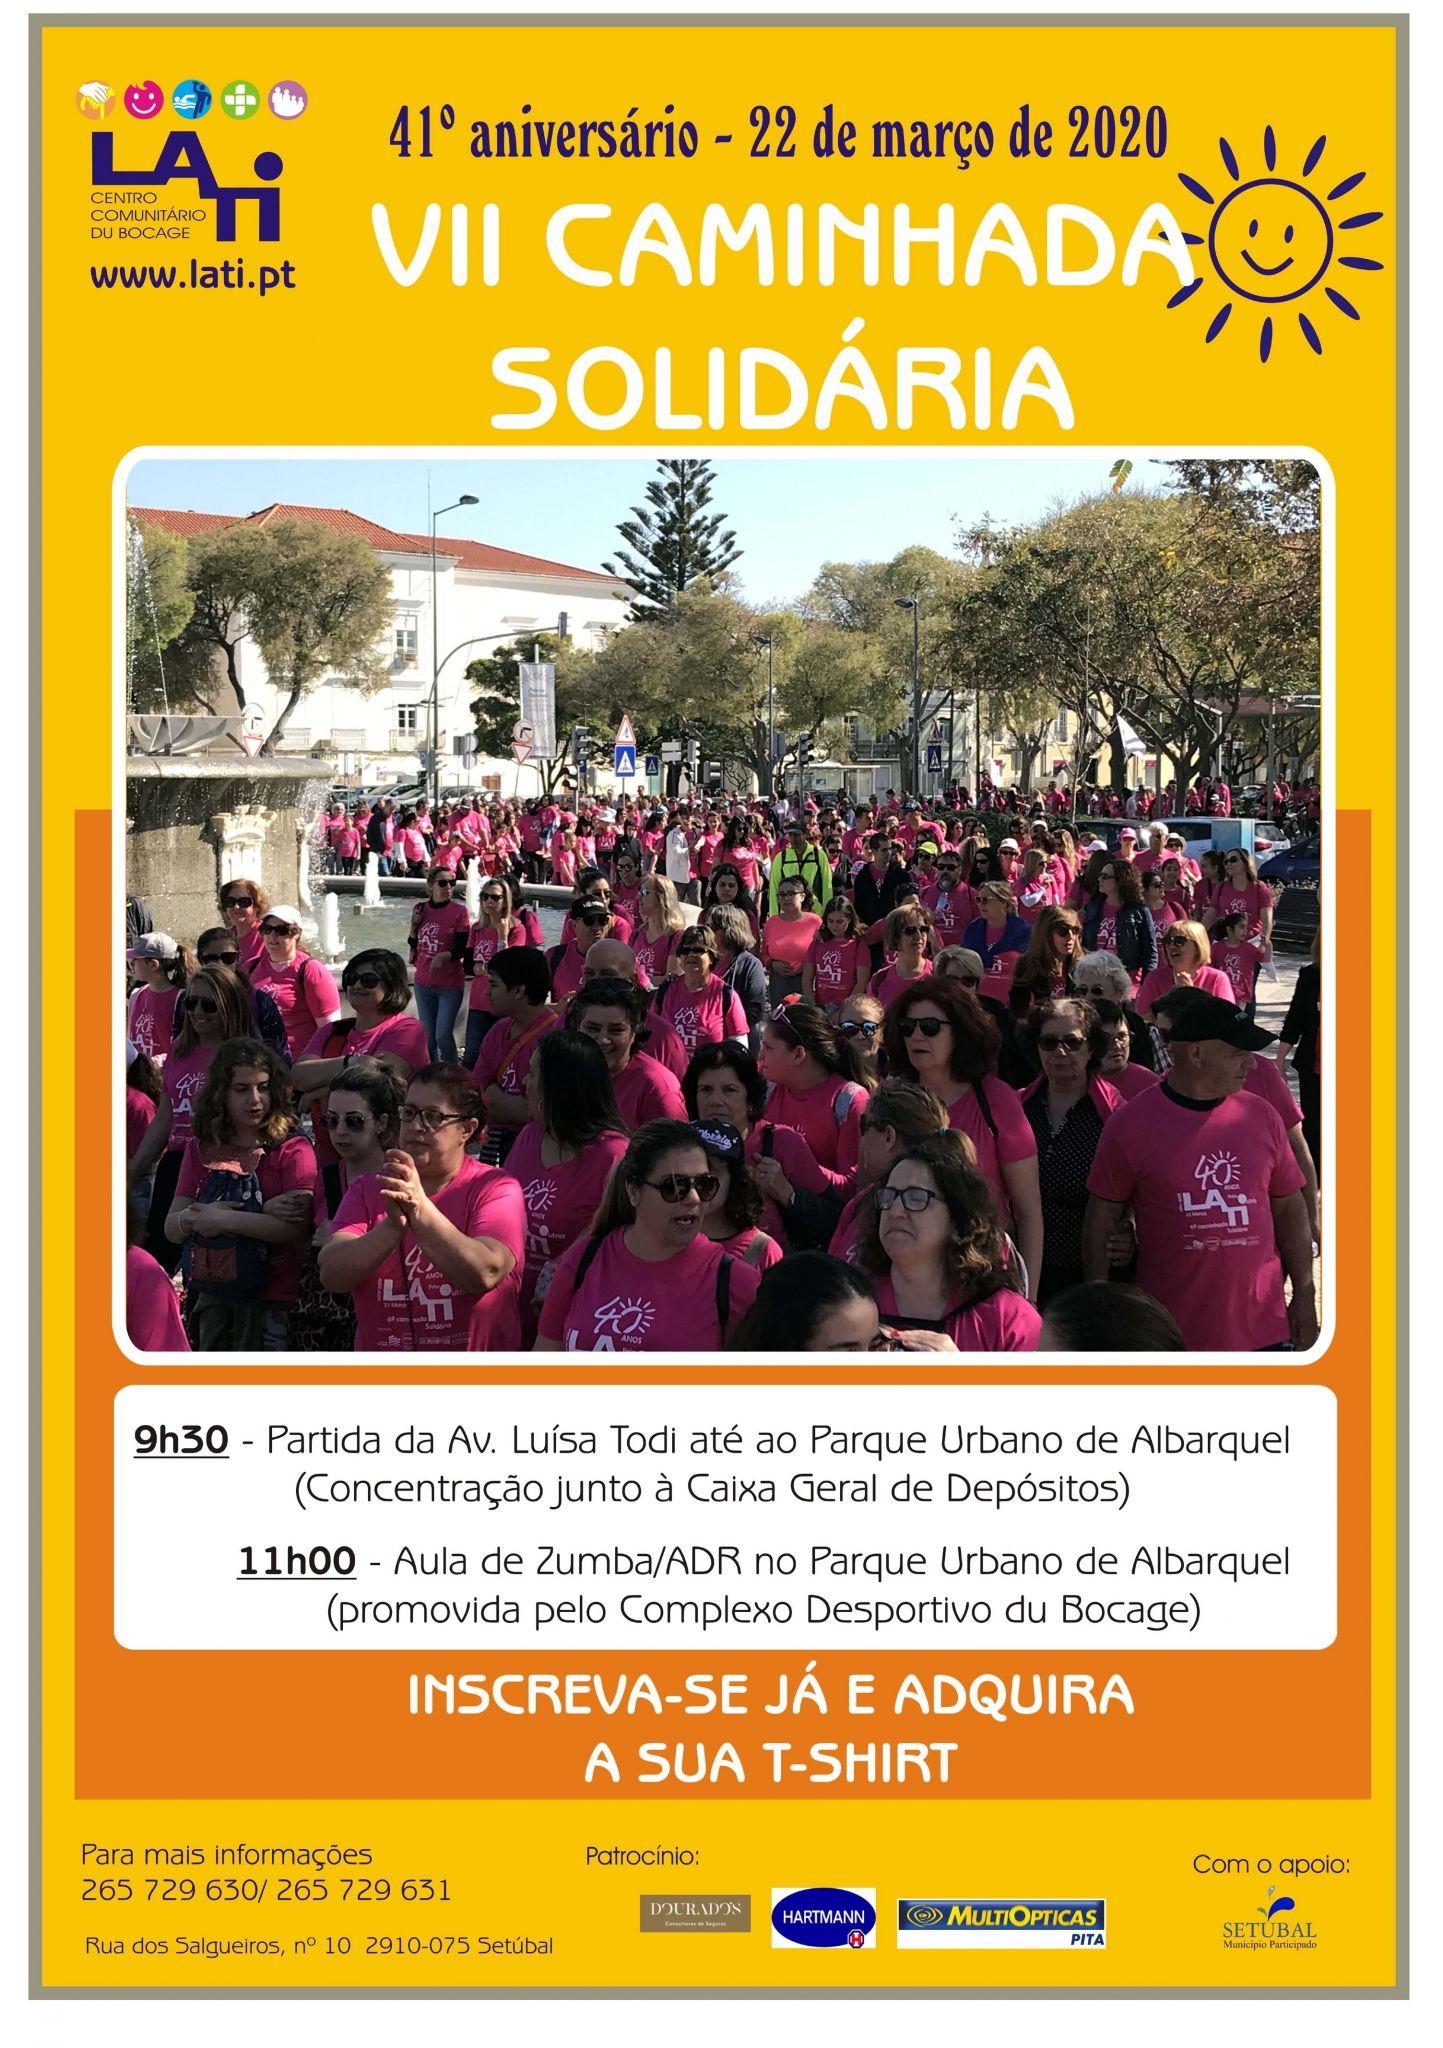 Participe na VII Caminhada Solidária da LATI